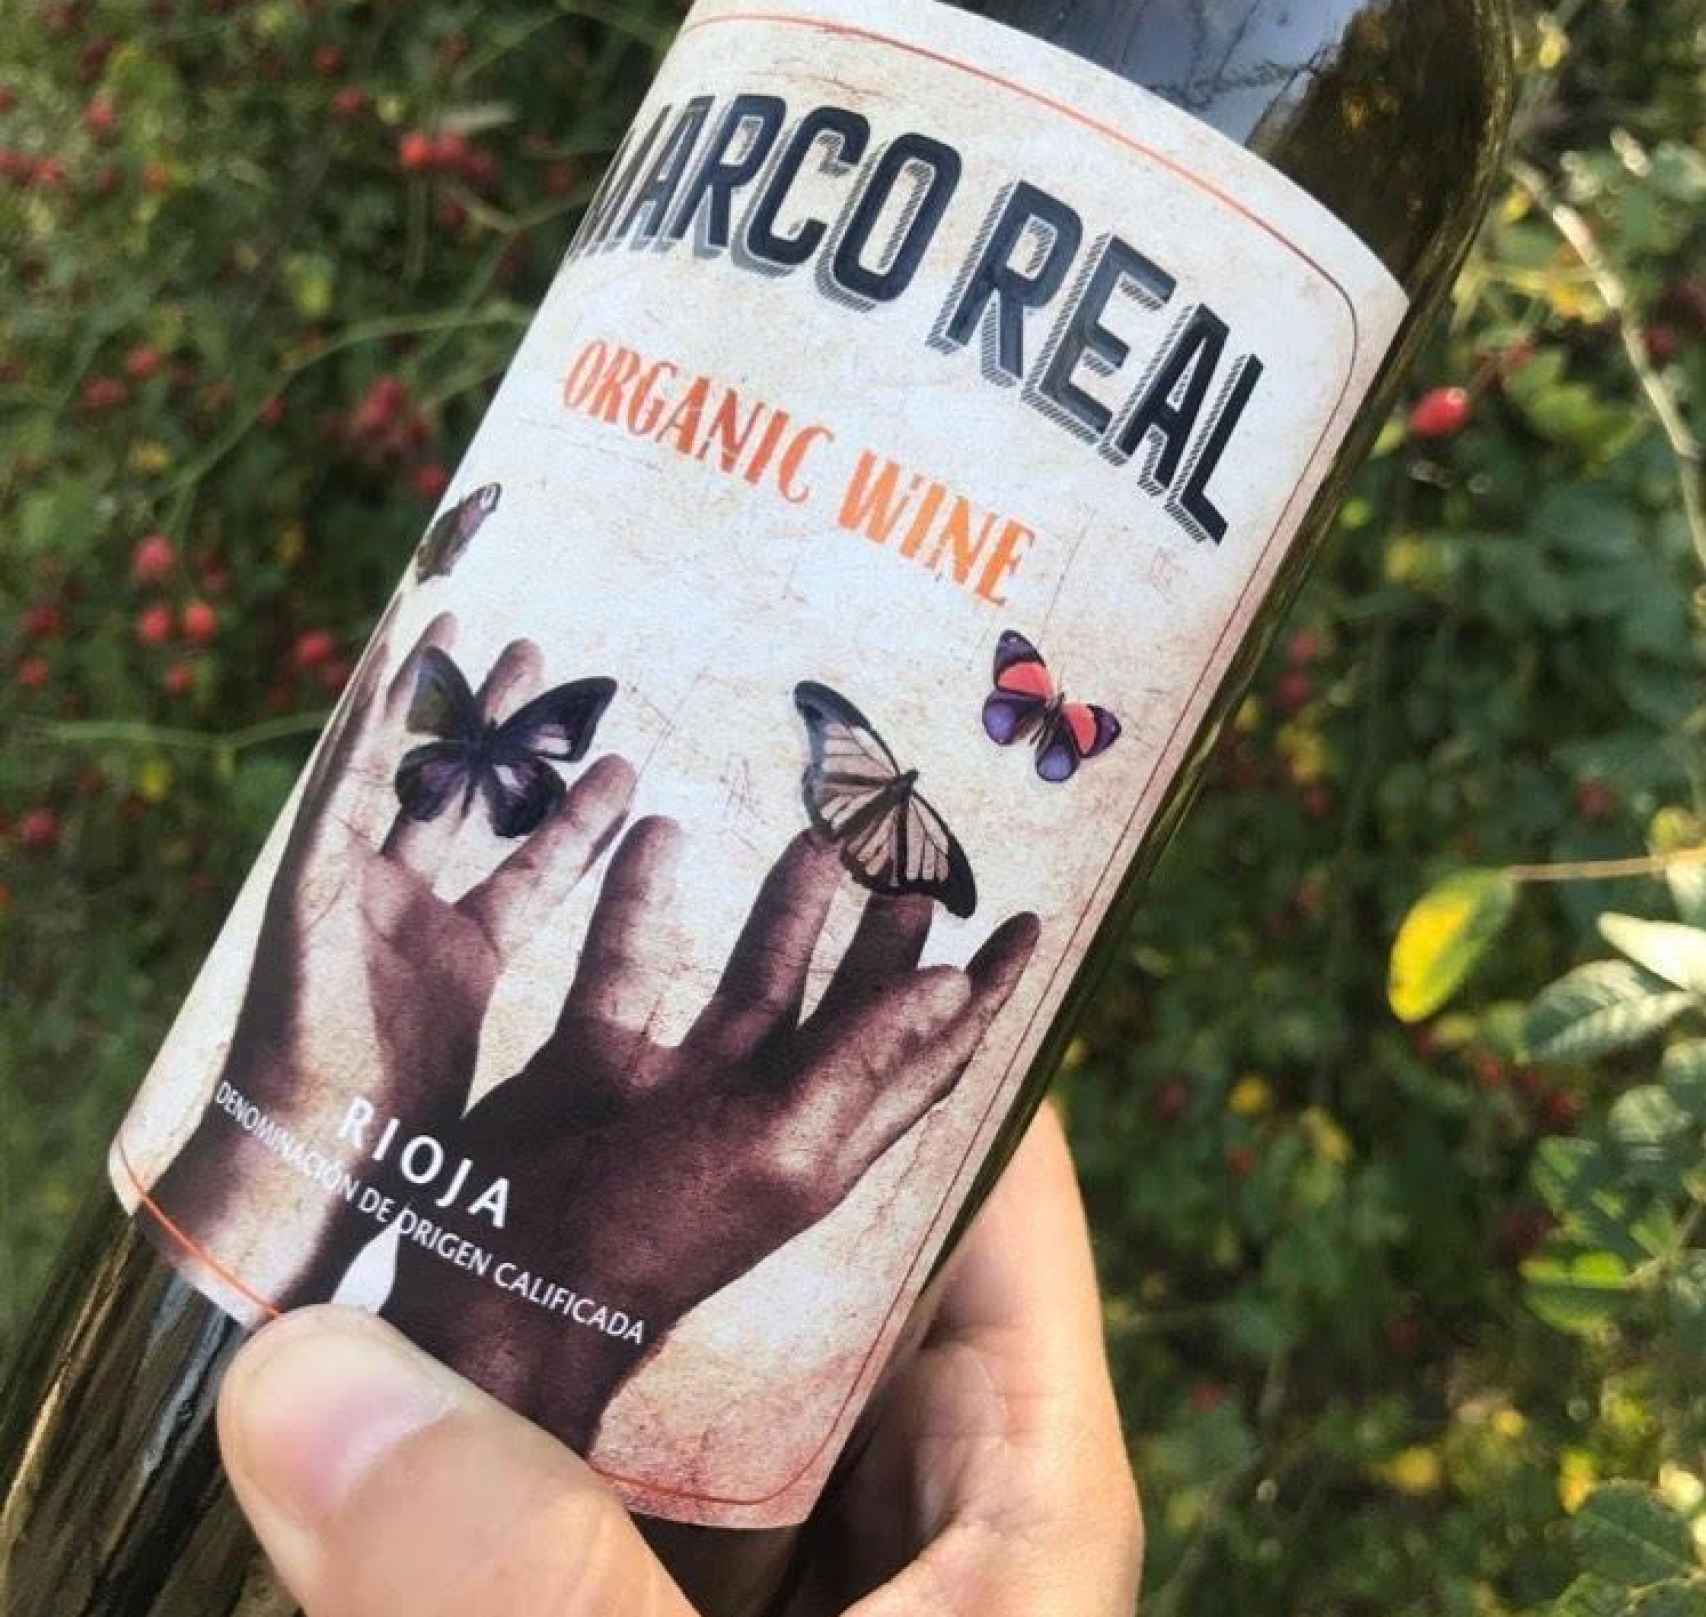 Marco Real Organic Wine.